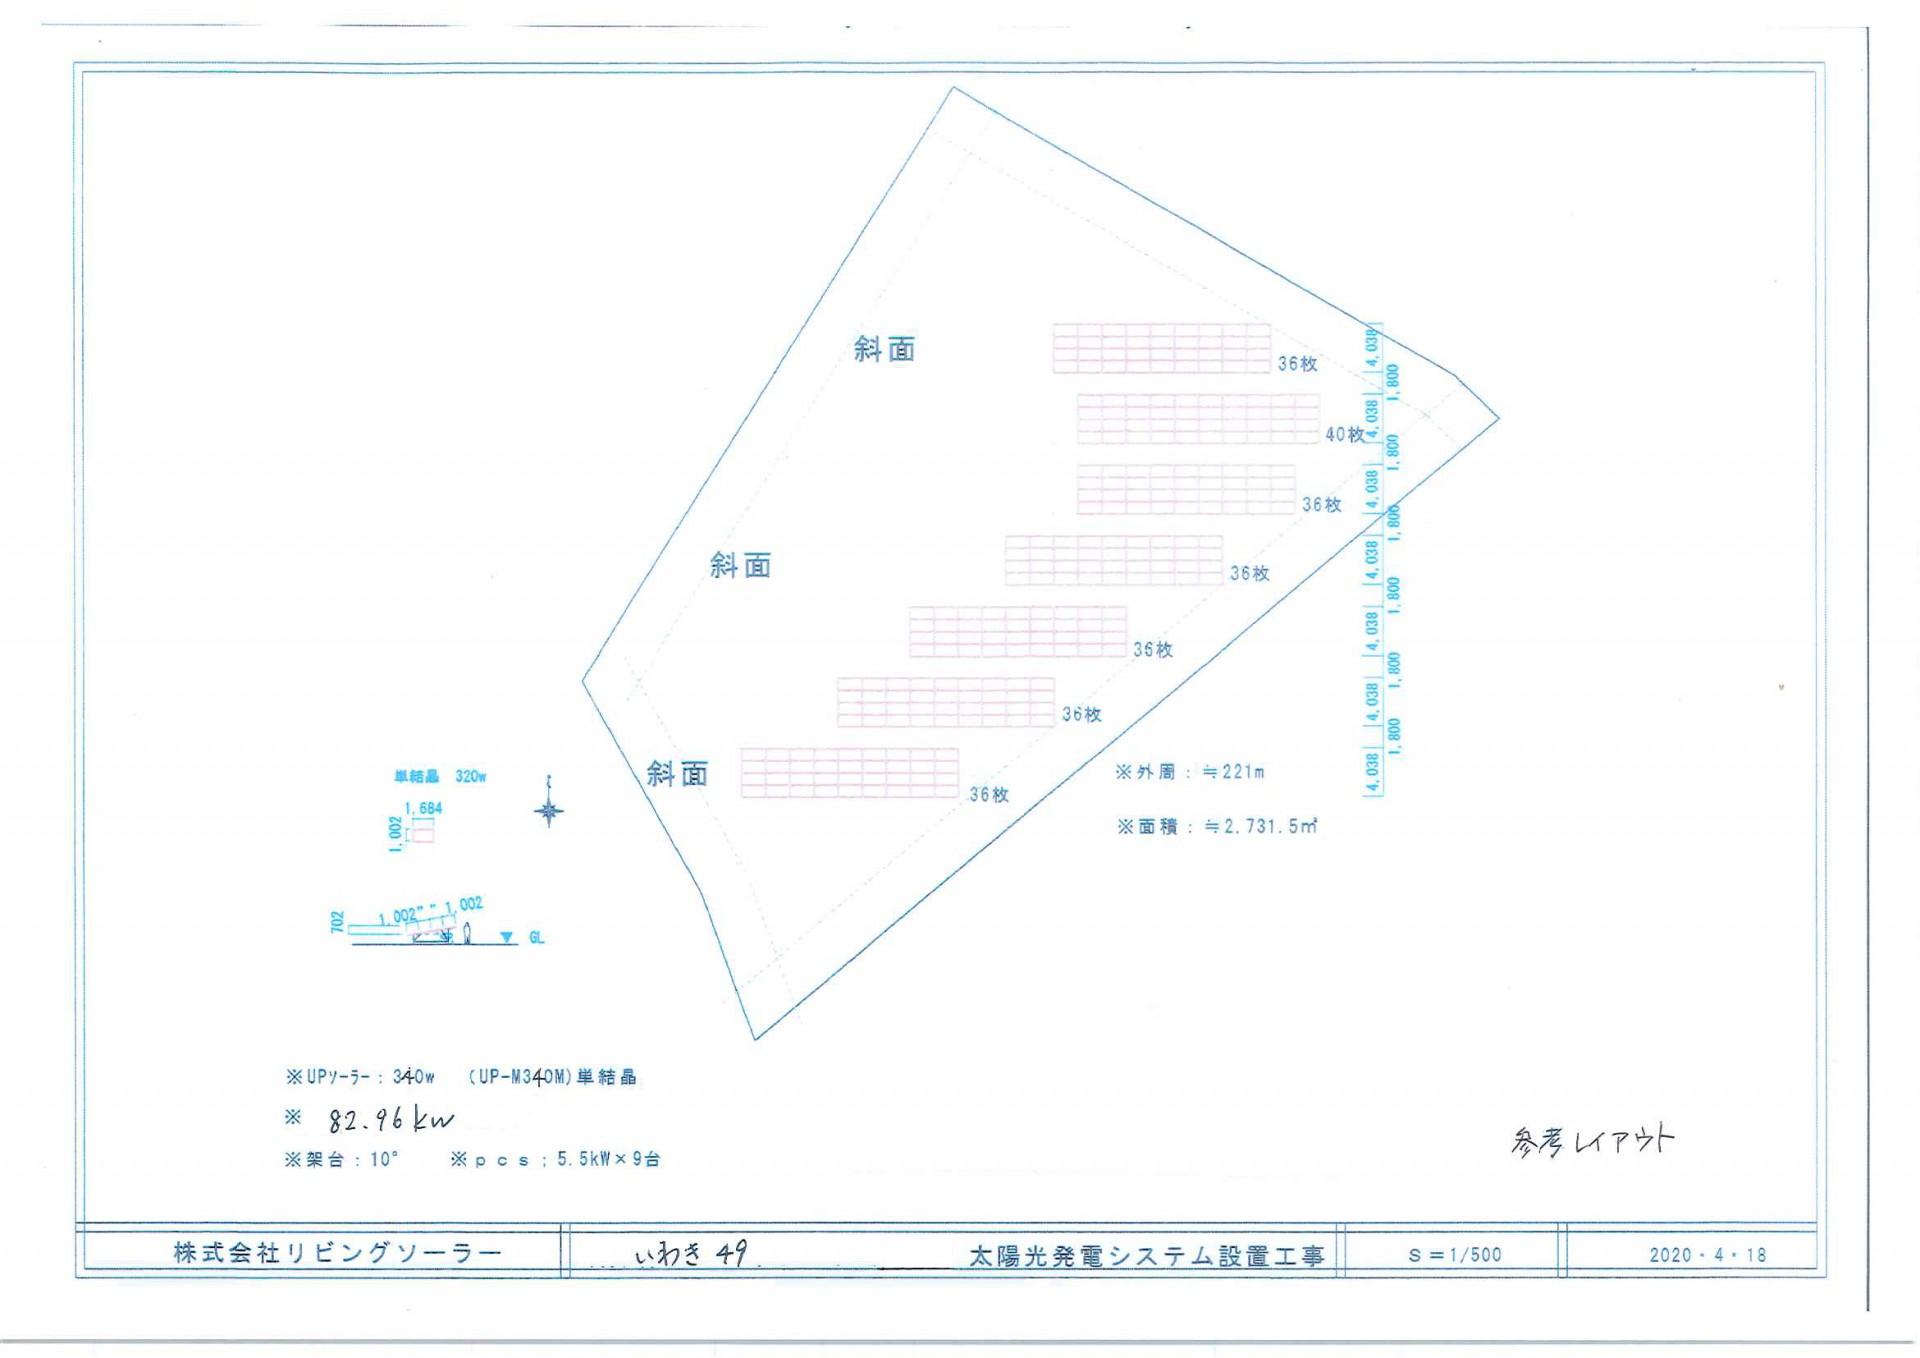 【LS】FIT14円 福島県いわき49発電所(復興特区案件)のメイン画像